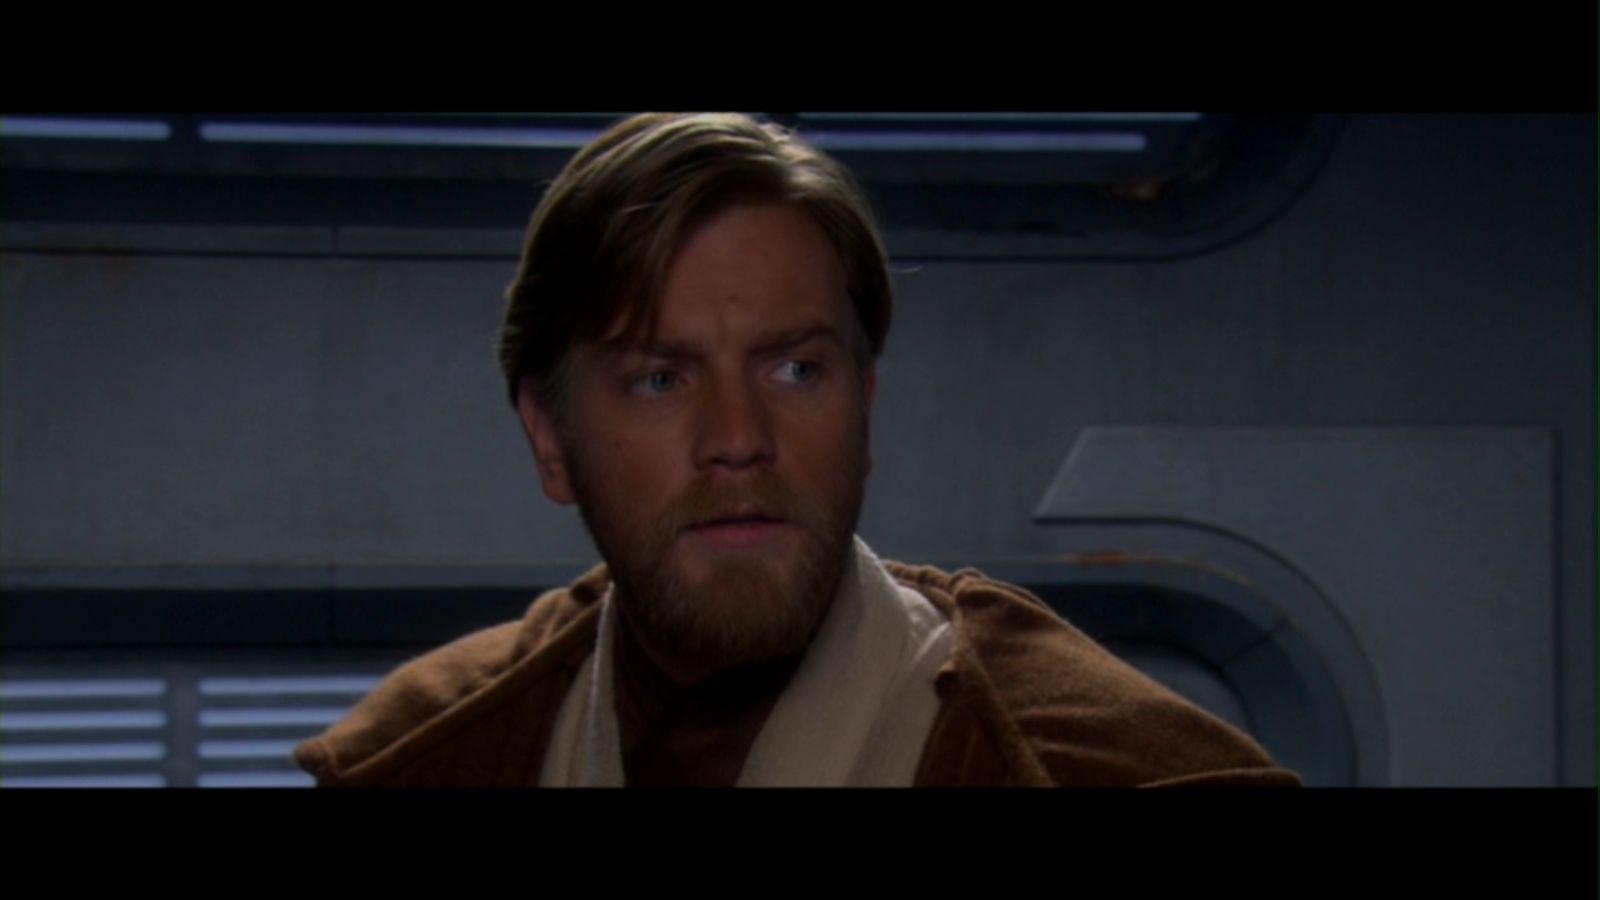 Obi Wan Kenobi Revenge Of The Sith Obi Wan Kenobi Image 23983340 Fanpop